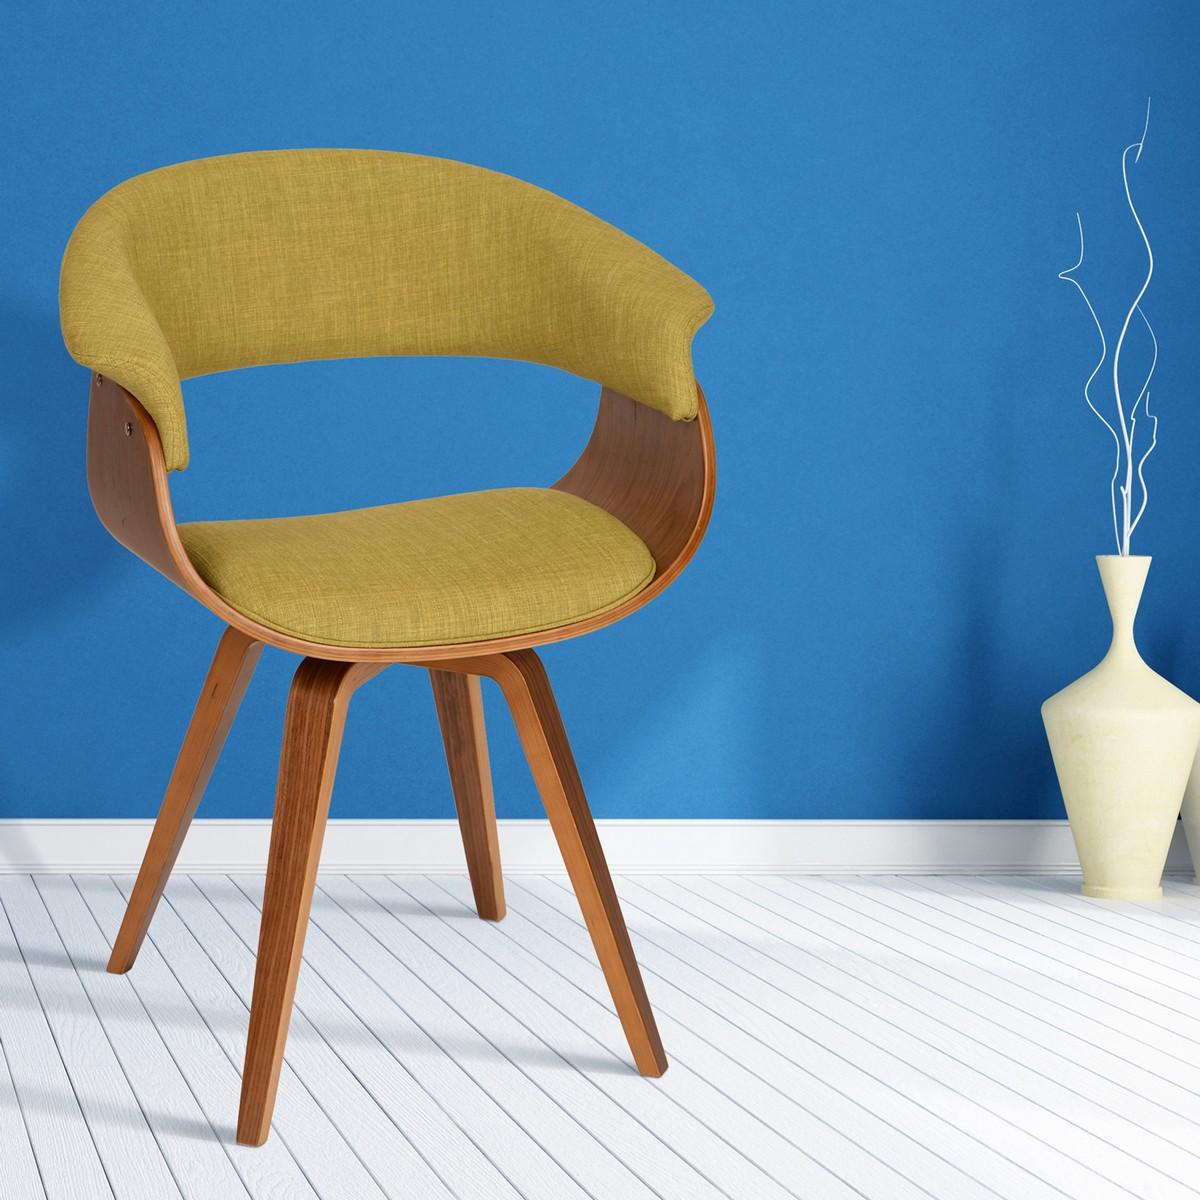 Armen Living Summer Modern Chair In Green Fabric and Walnut Wood